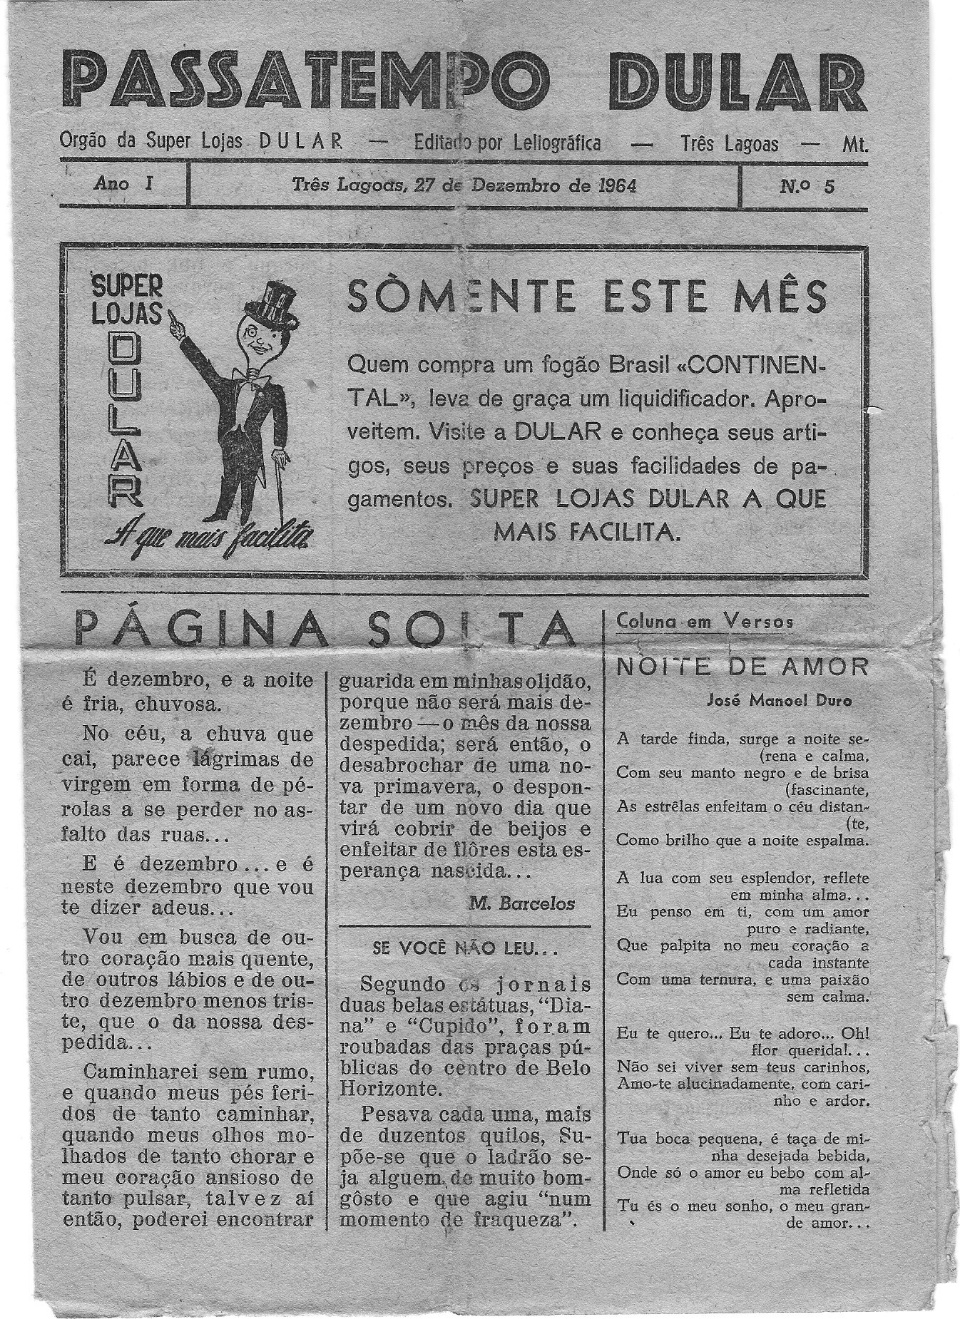 01. PASSATEMPO DULAR - 13 a 27.12.1964